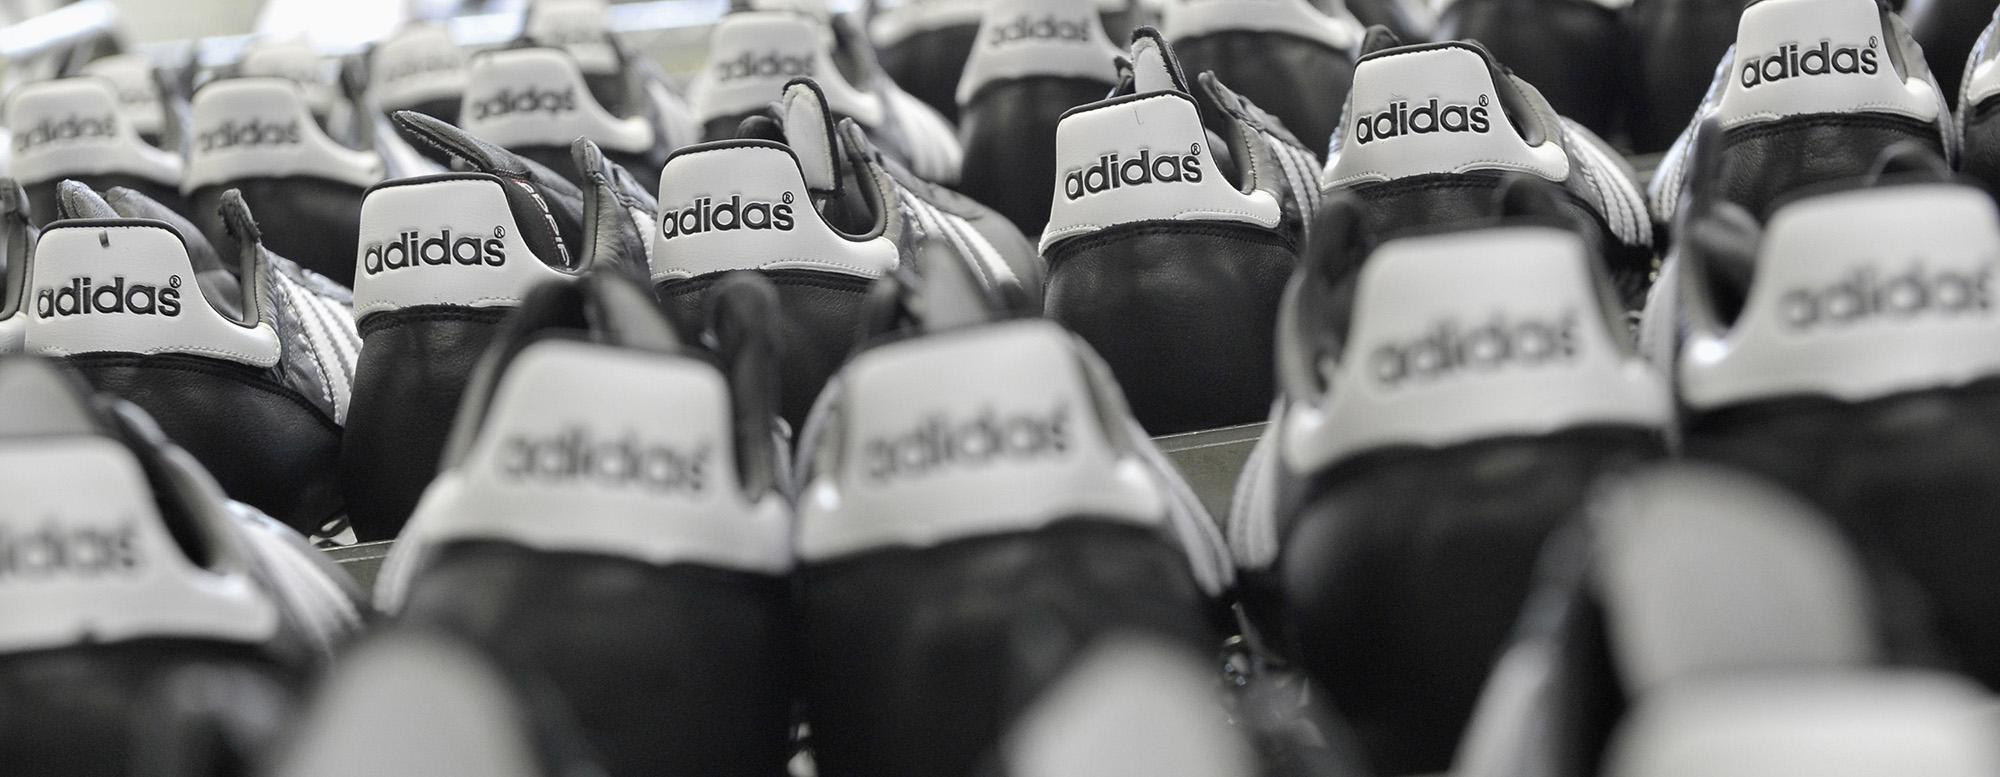 Adidas Abandons Robotic Factory